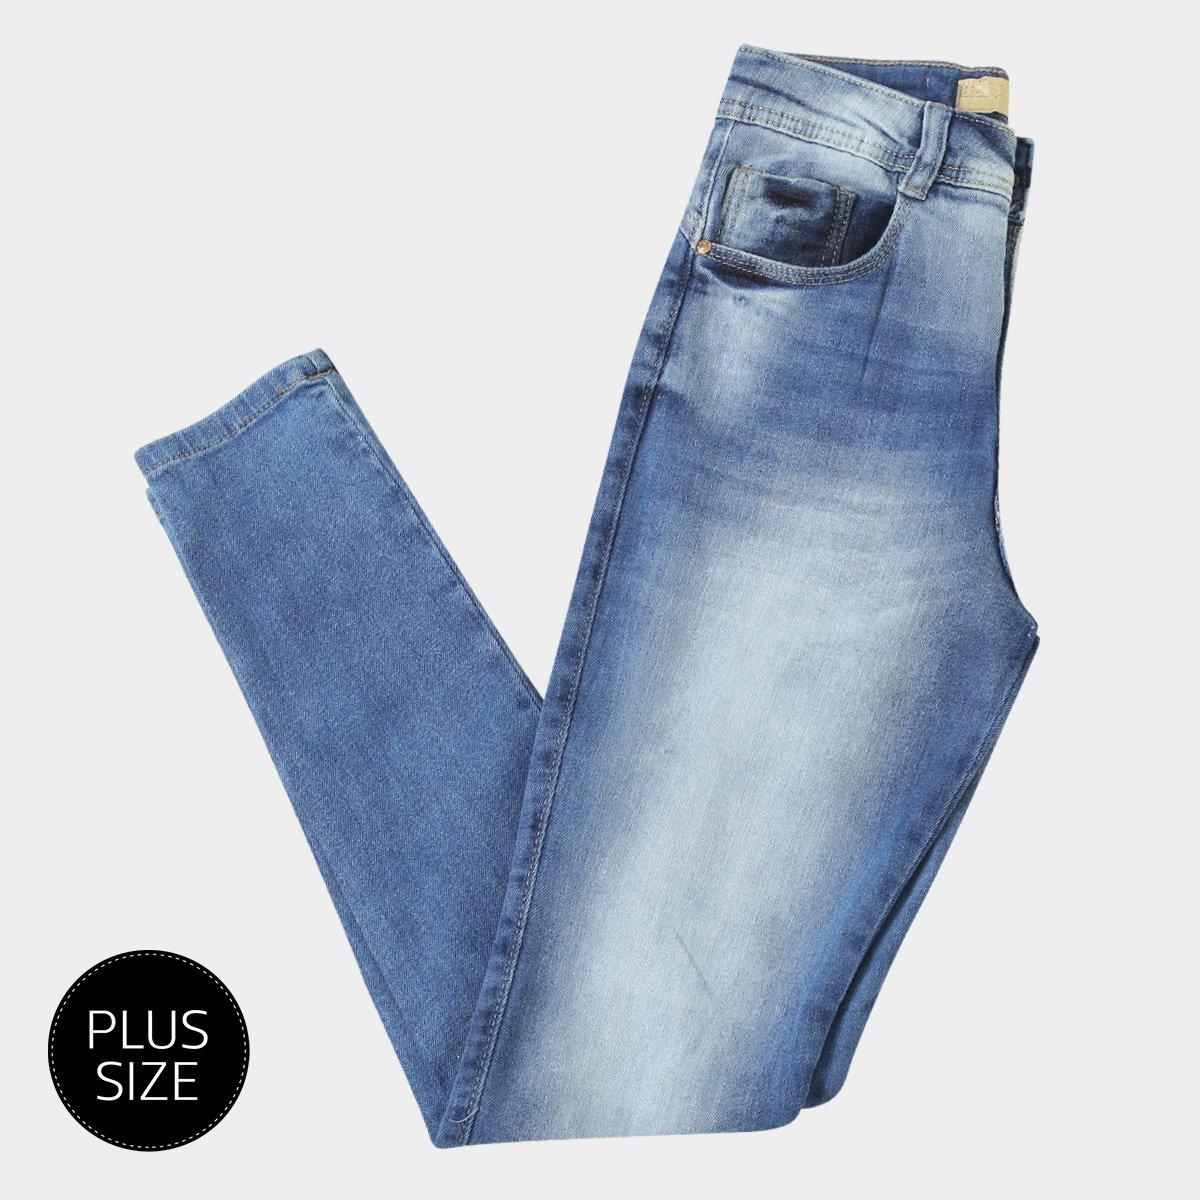 96acb2ffd Calça Jeans Skinny Biotipo Estonada Cintura Alta Plus Size Feminina